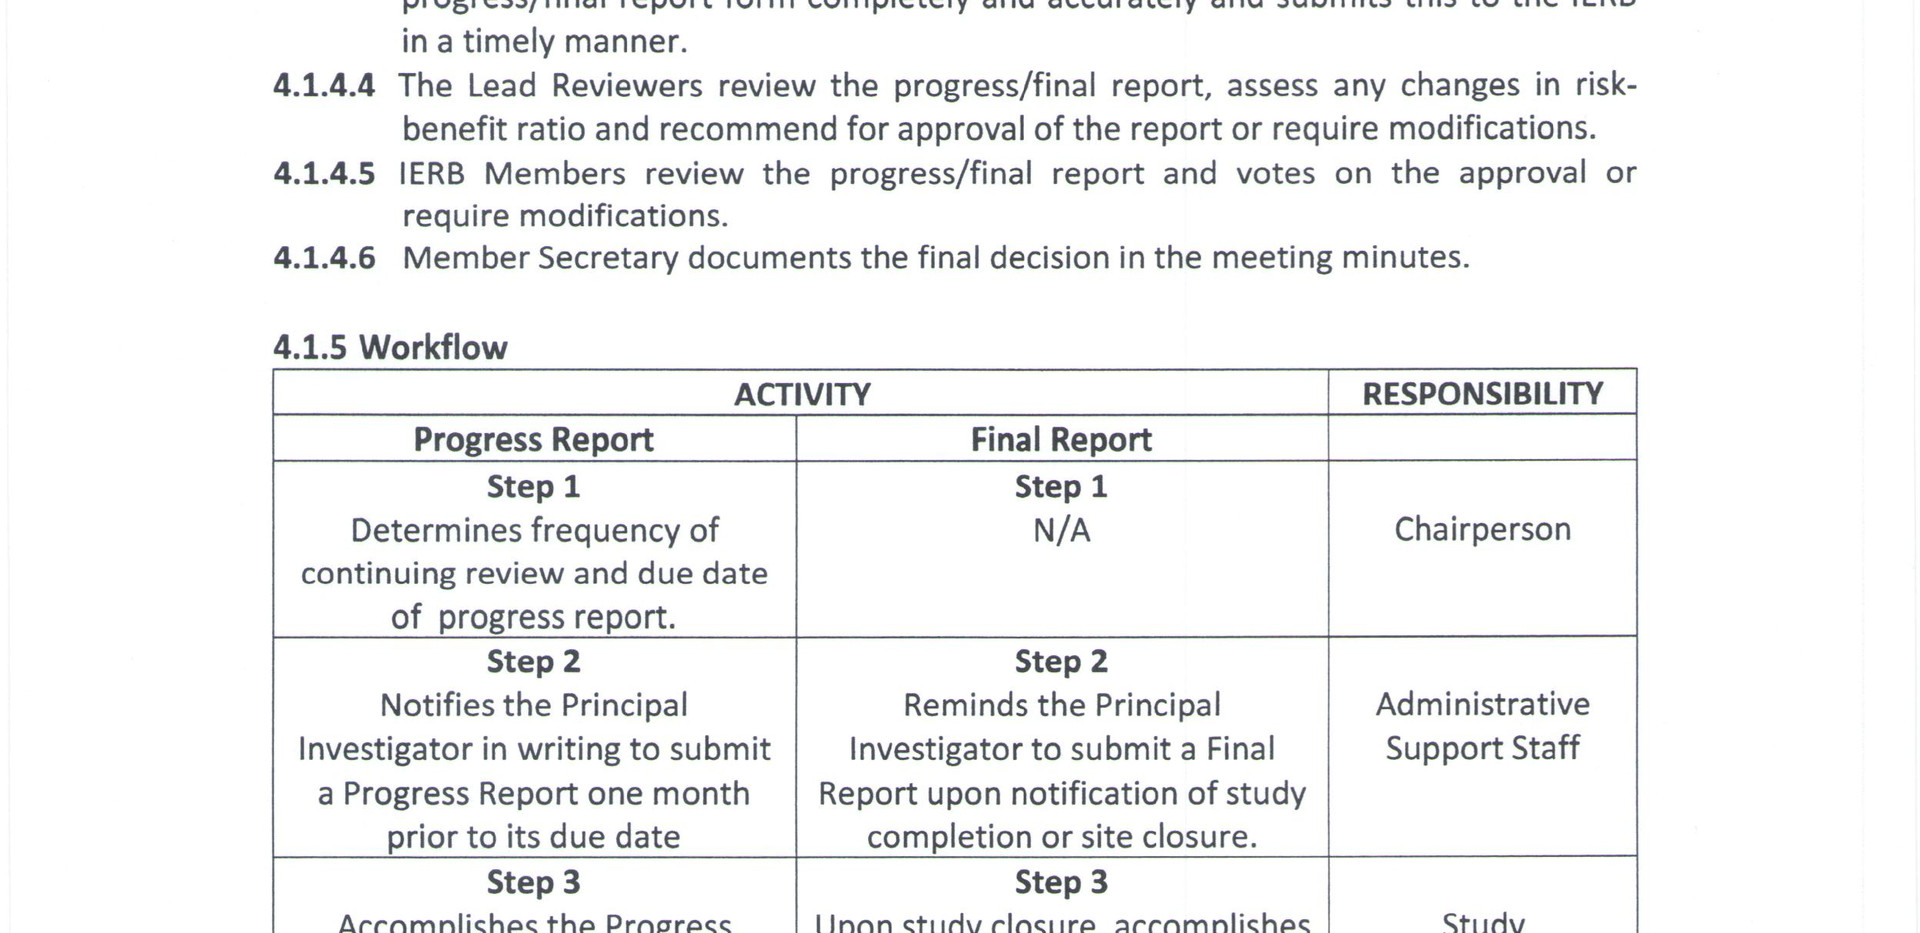 Review of Progress & Final Reports 2.jpg